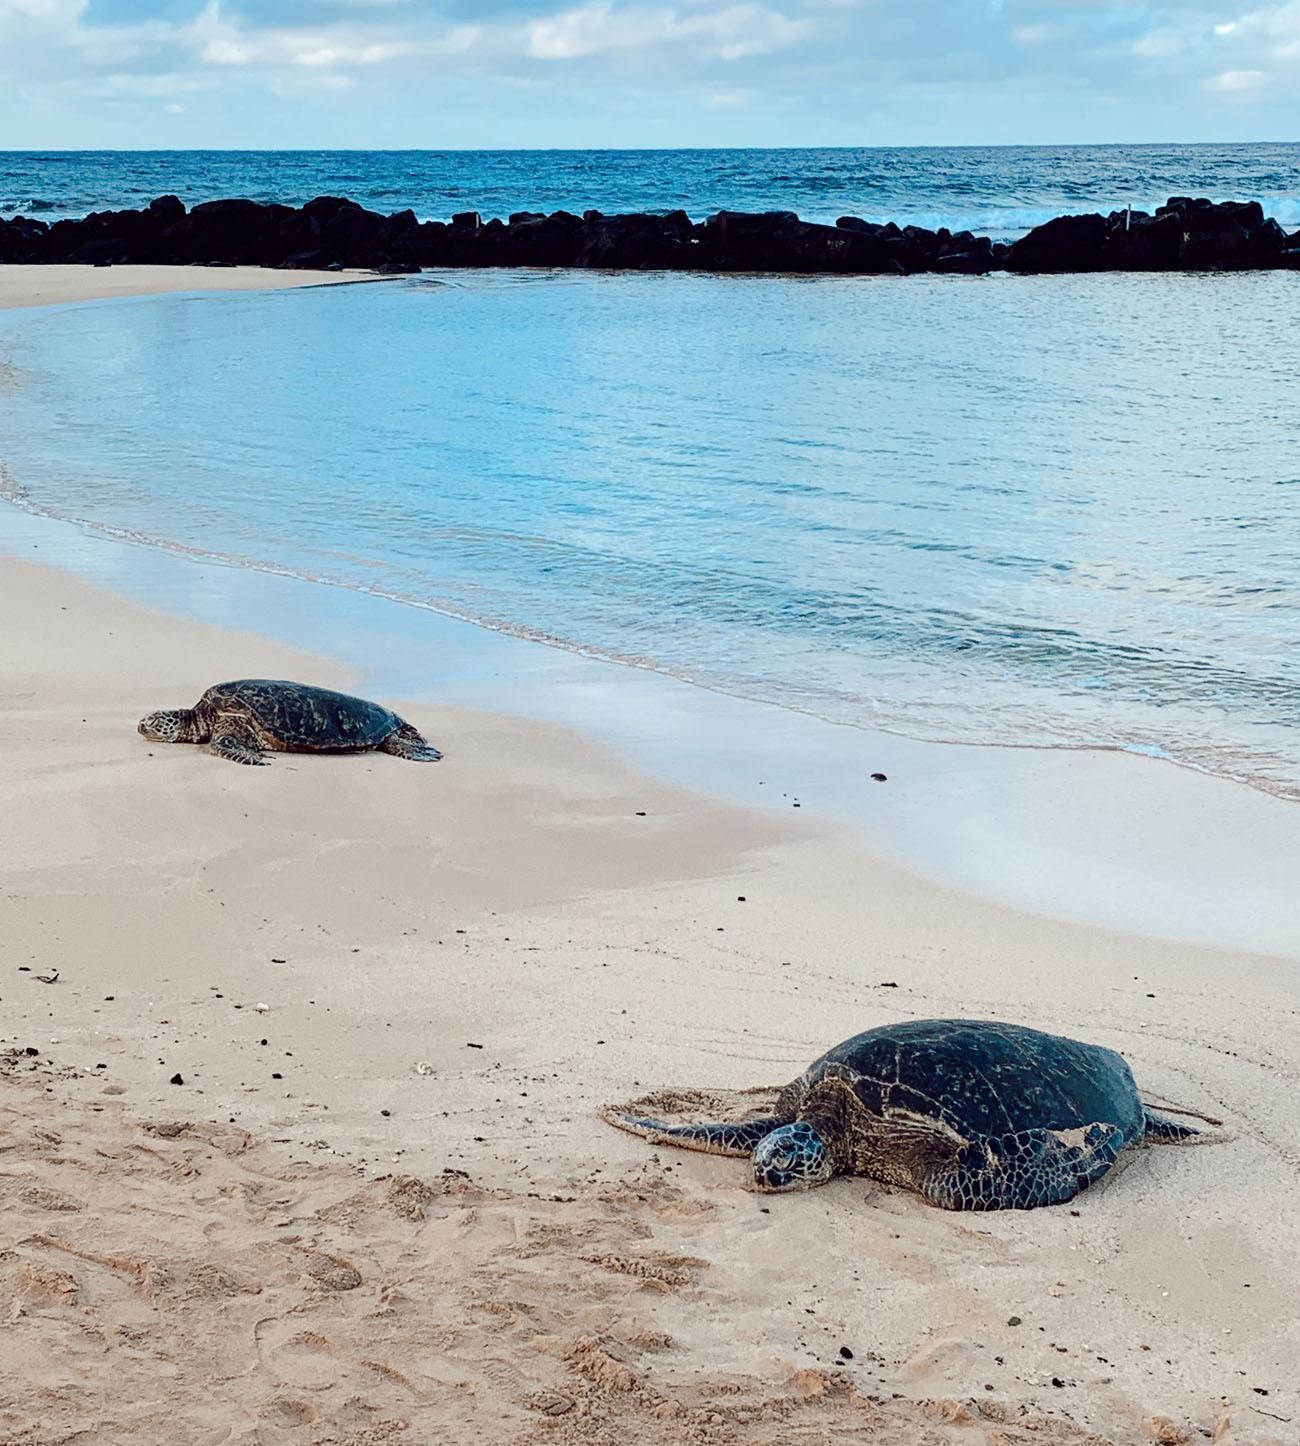 turtles on the beach in kauai